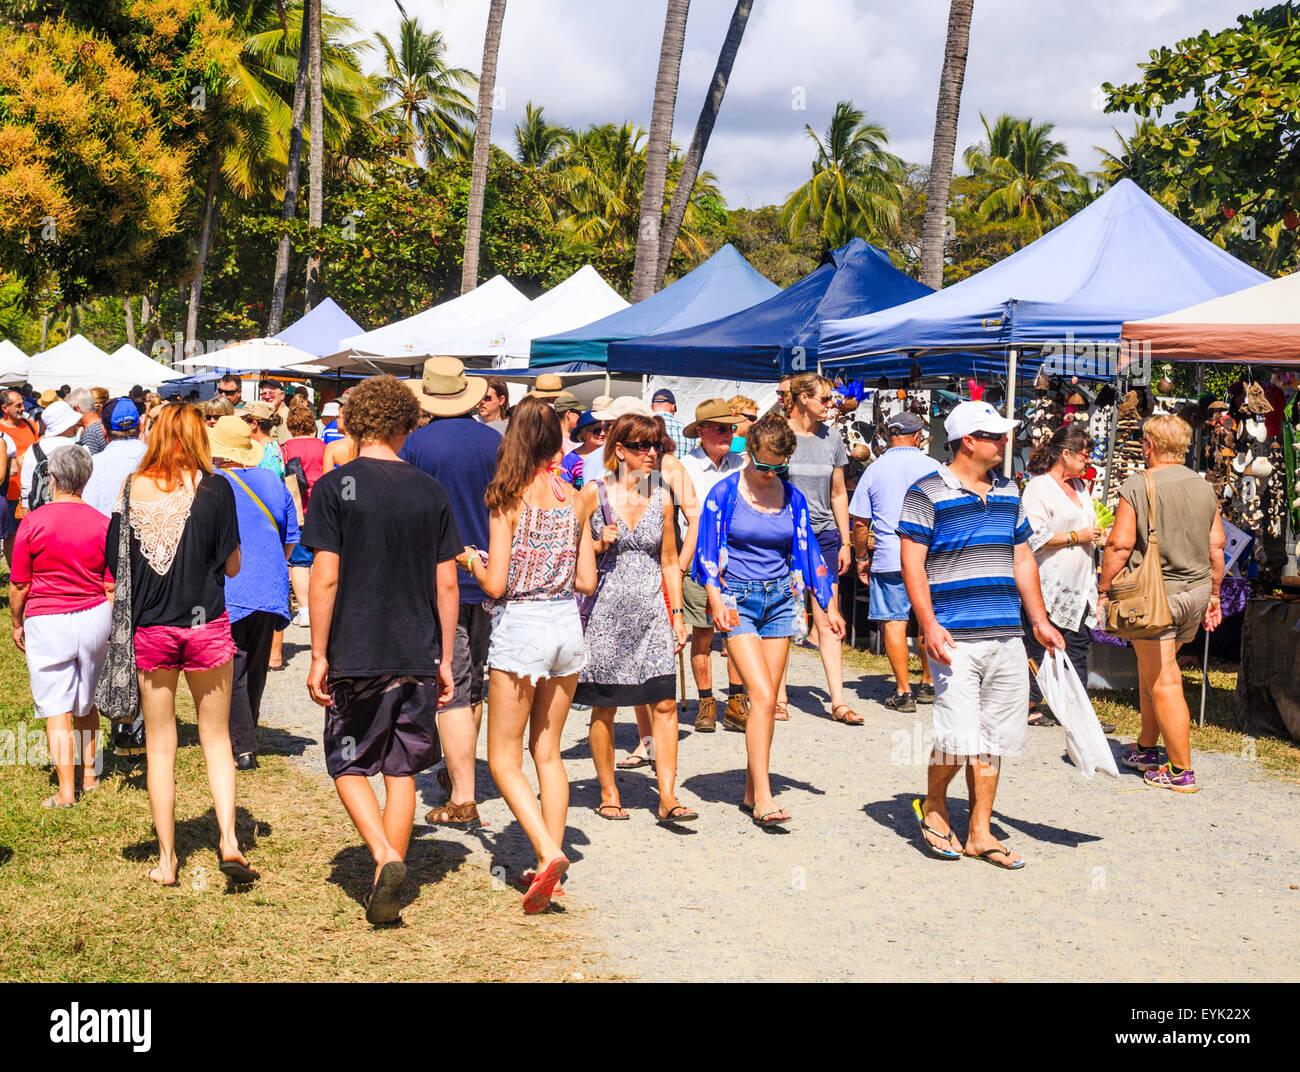 Port Douglas Sunday Markets. Port Douglas, Queensland - Stock Image